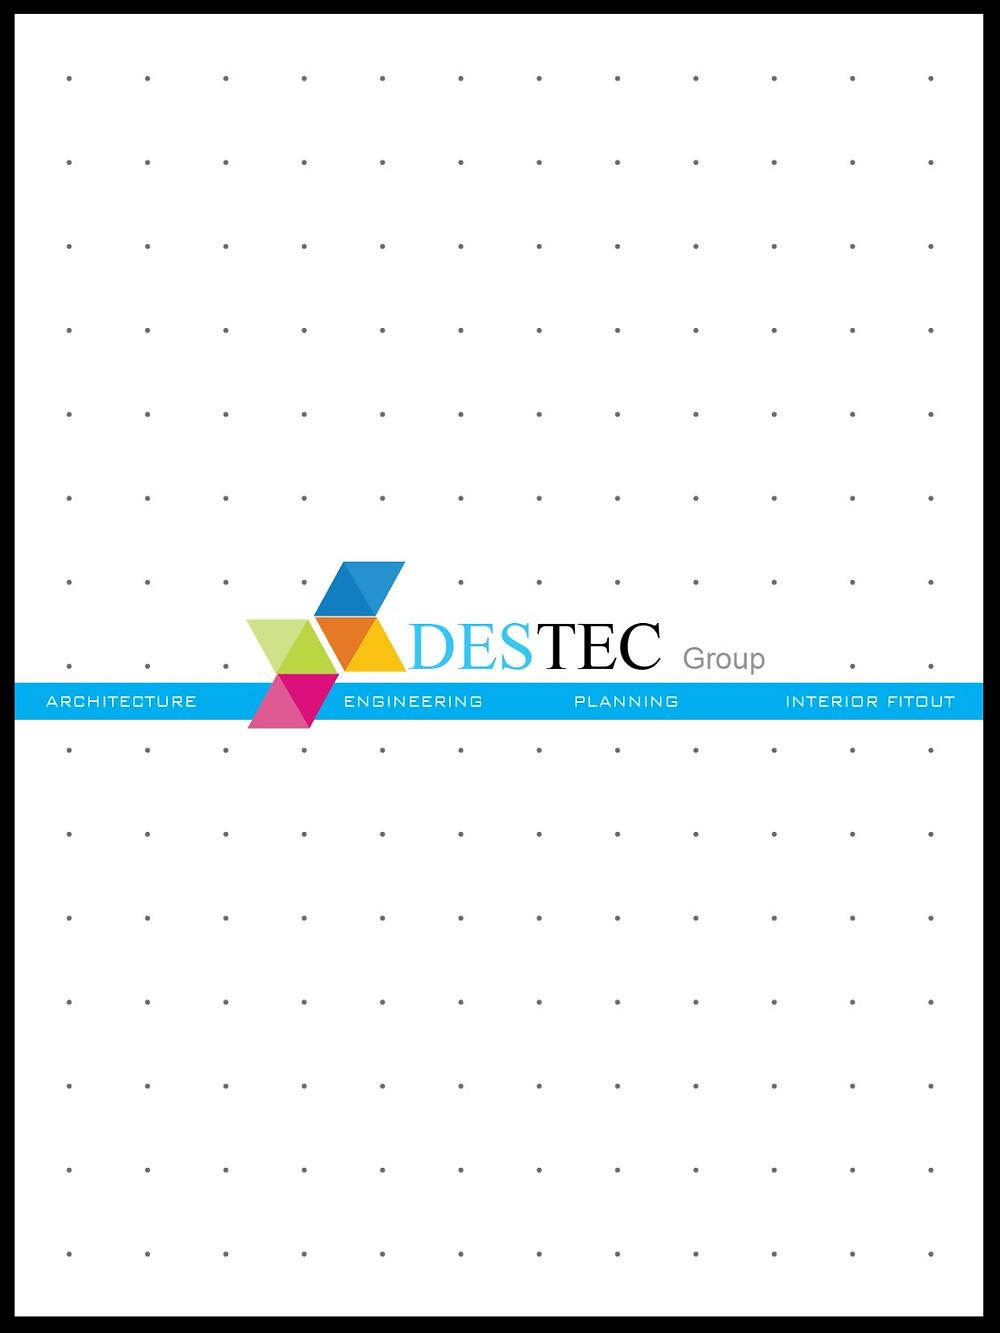 Destec Group - Company Profile